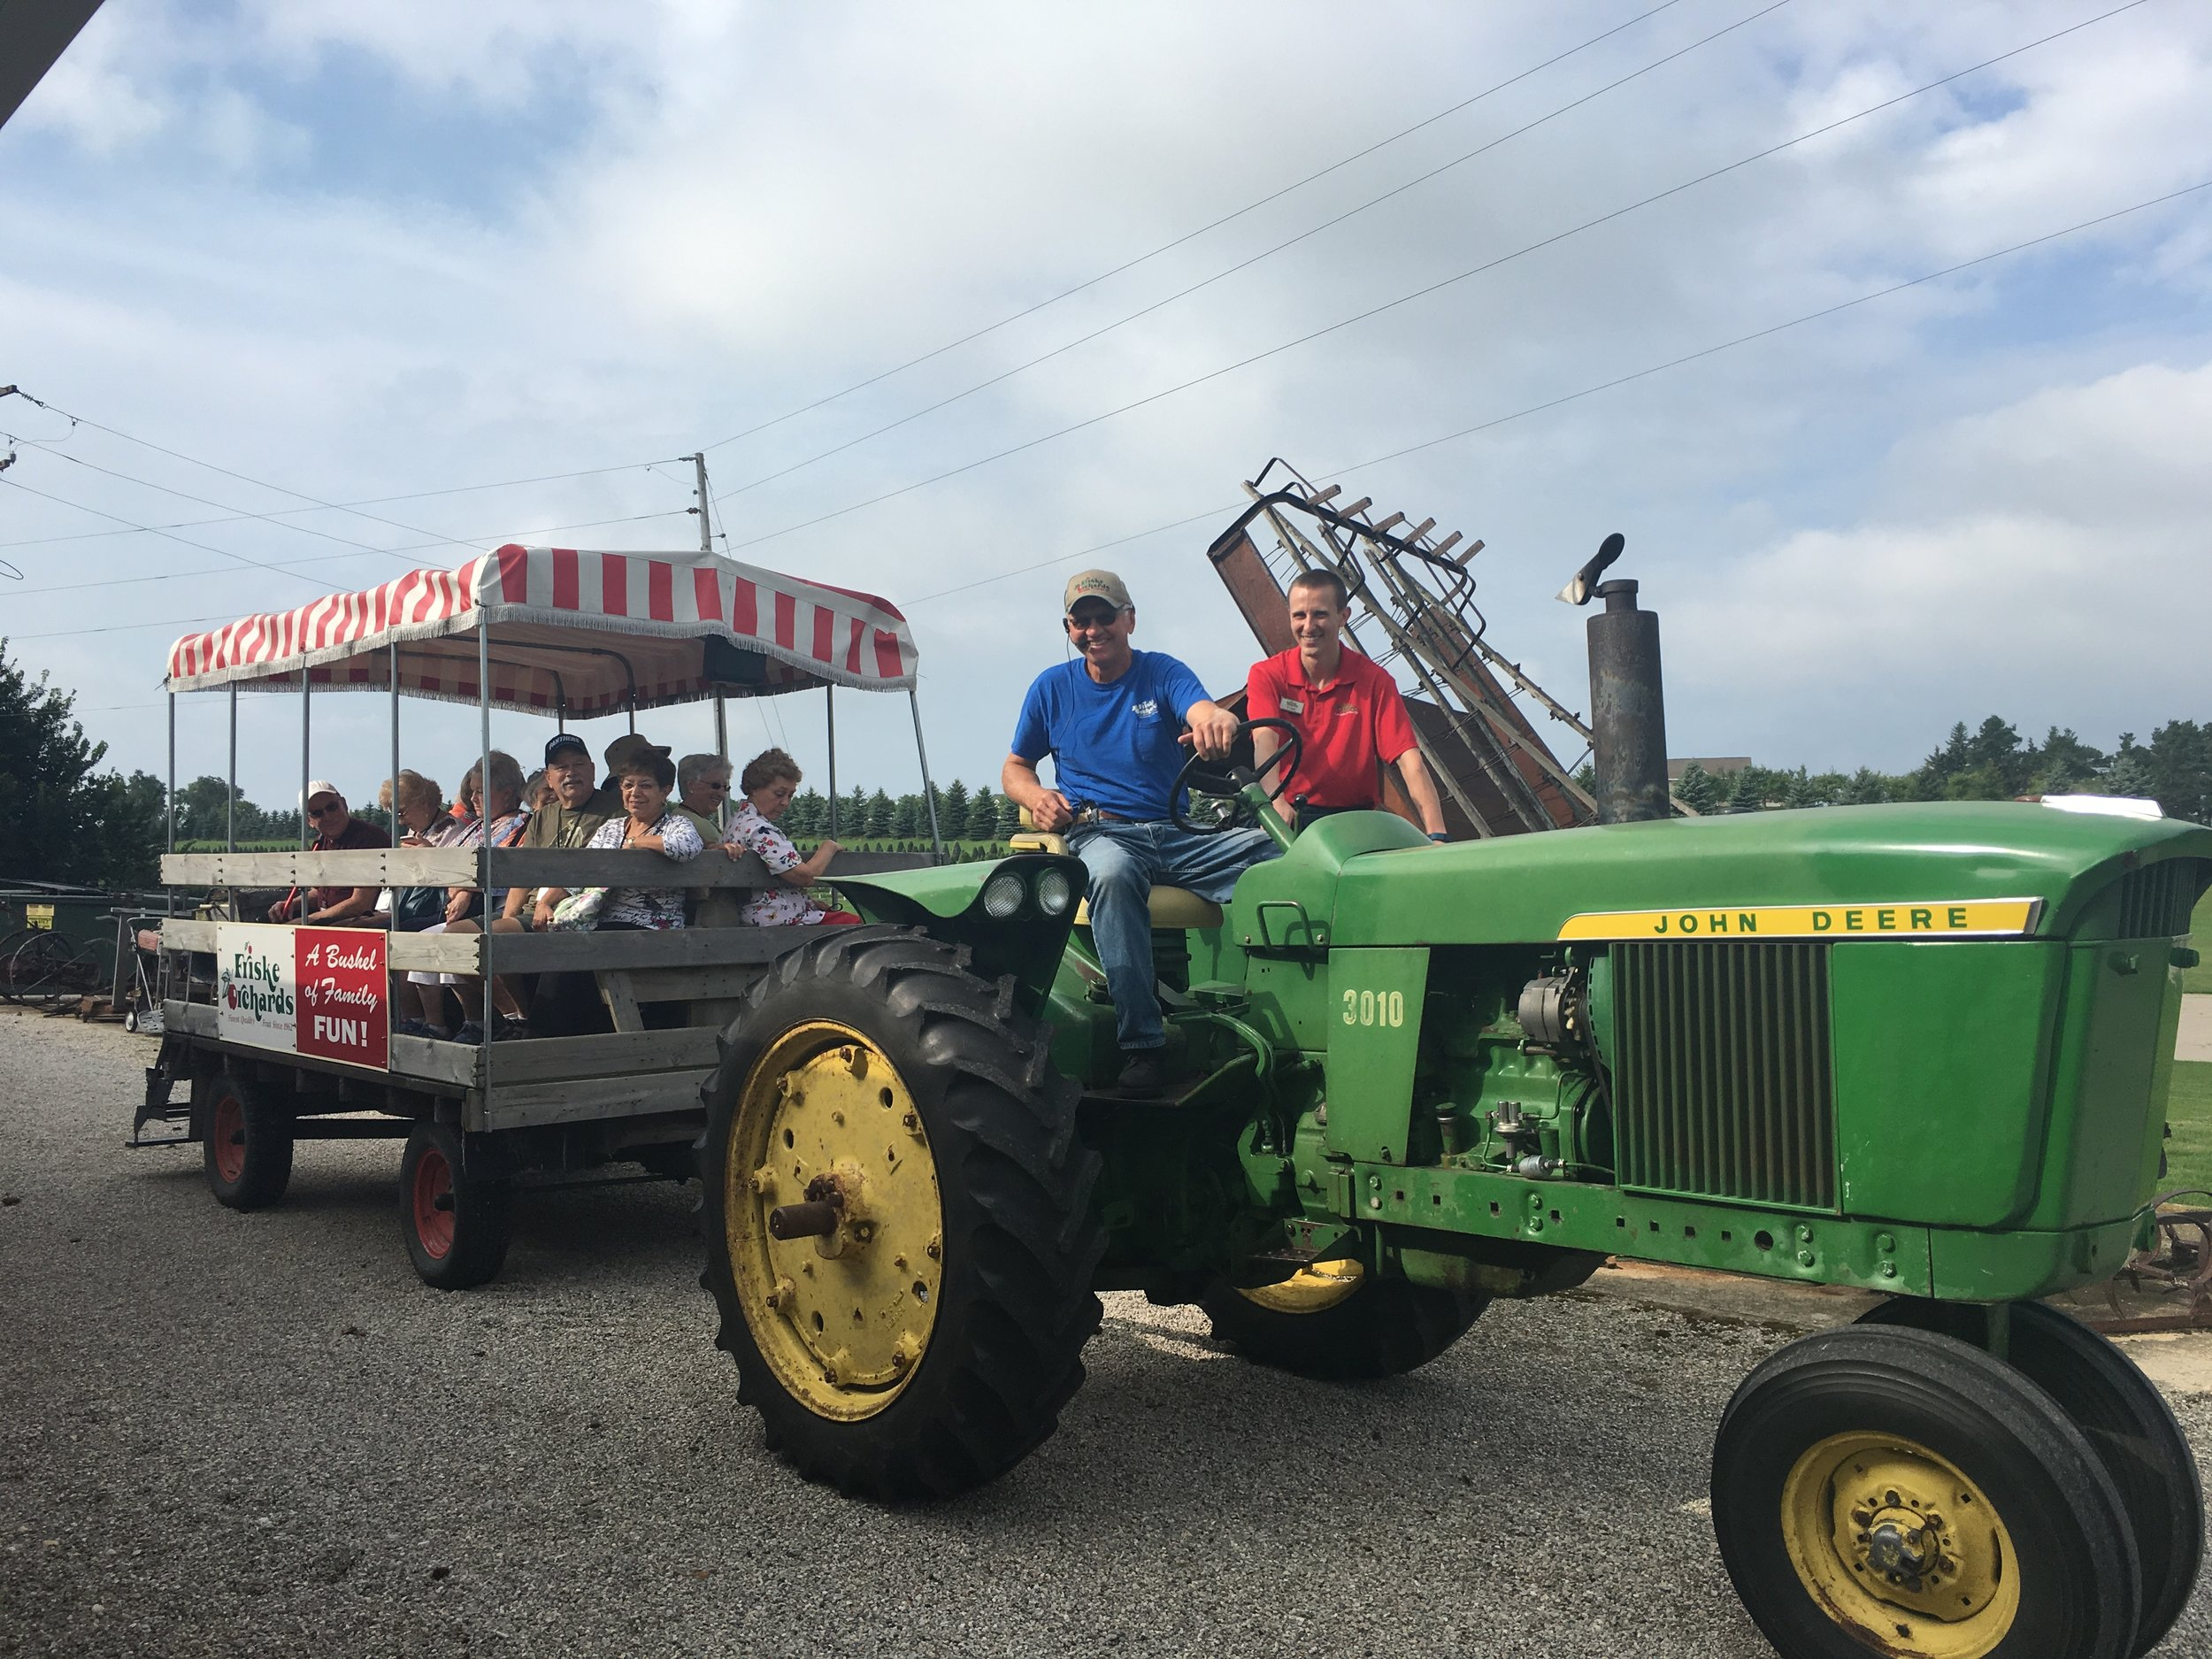 wagon-rides-friskes-farm-market